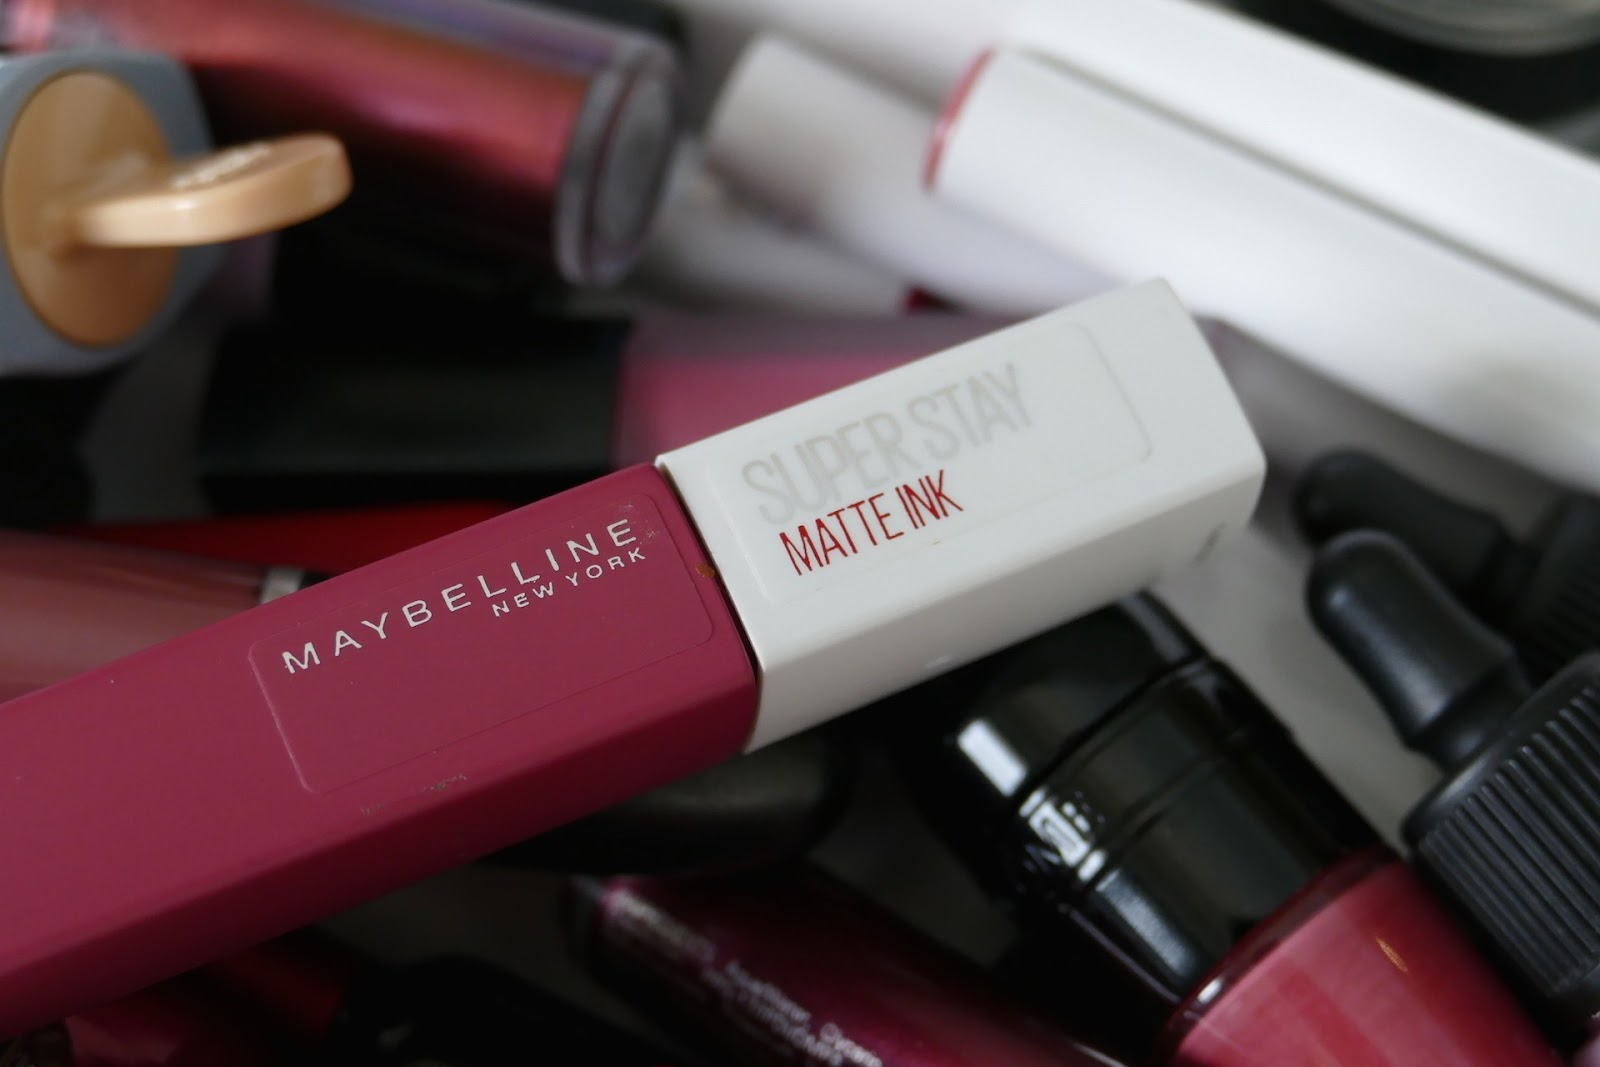 India's Number 2 Lipstick